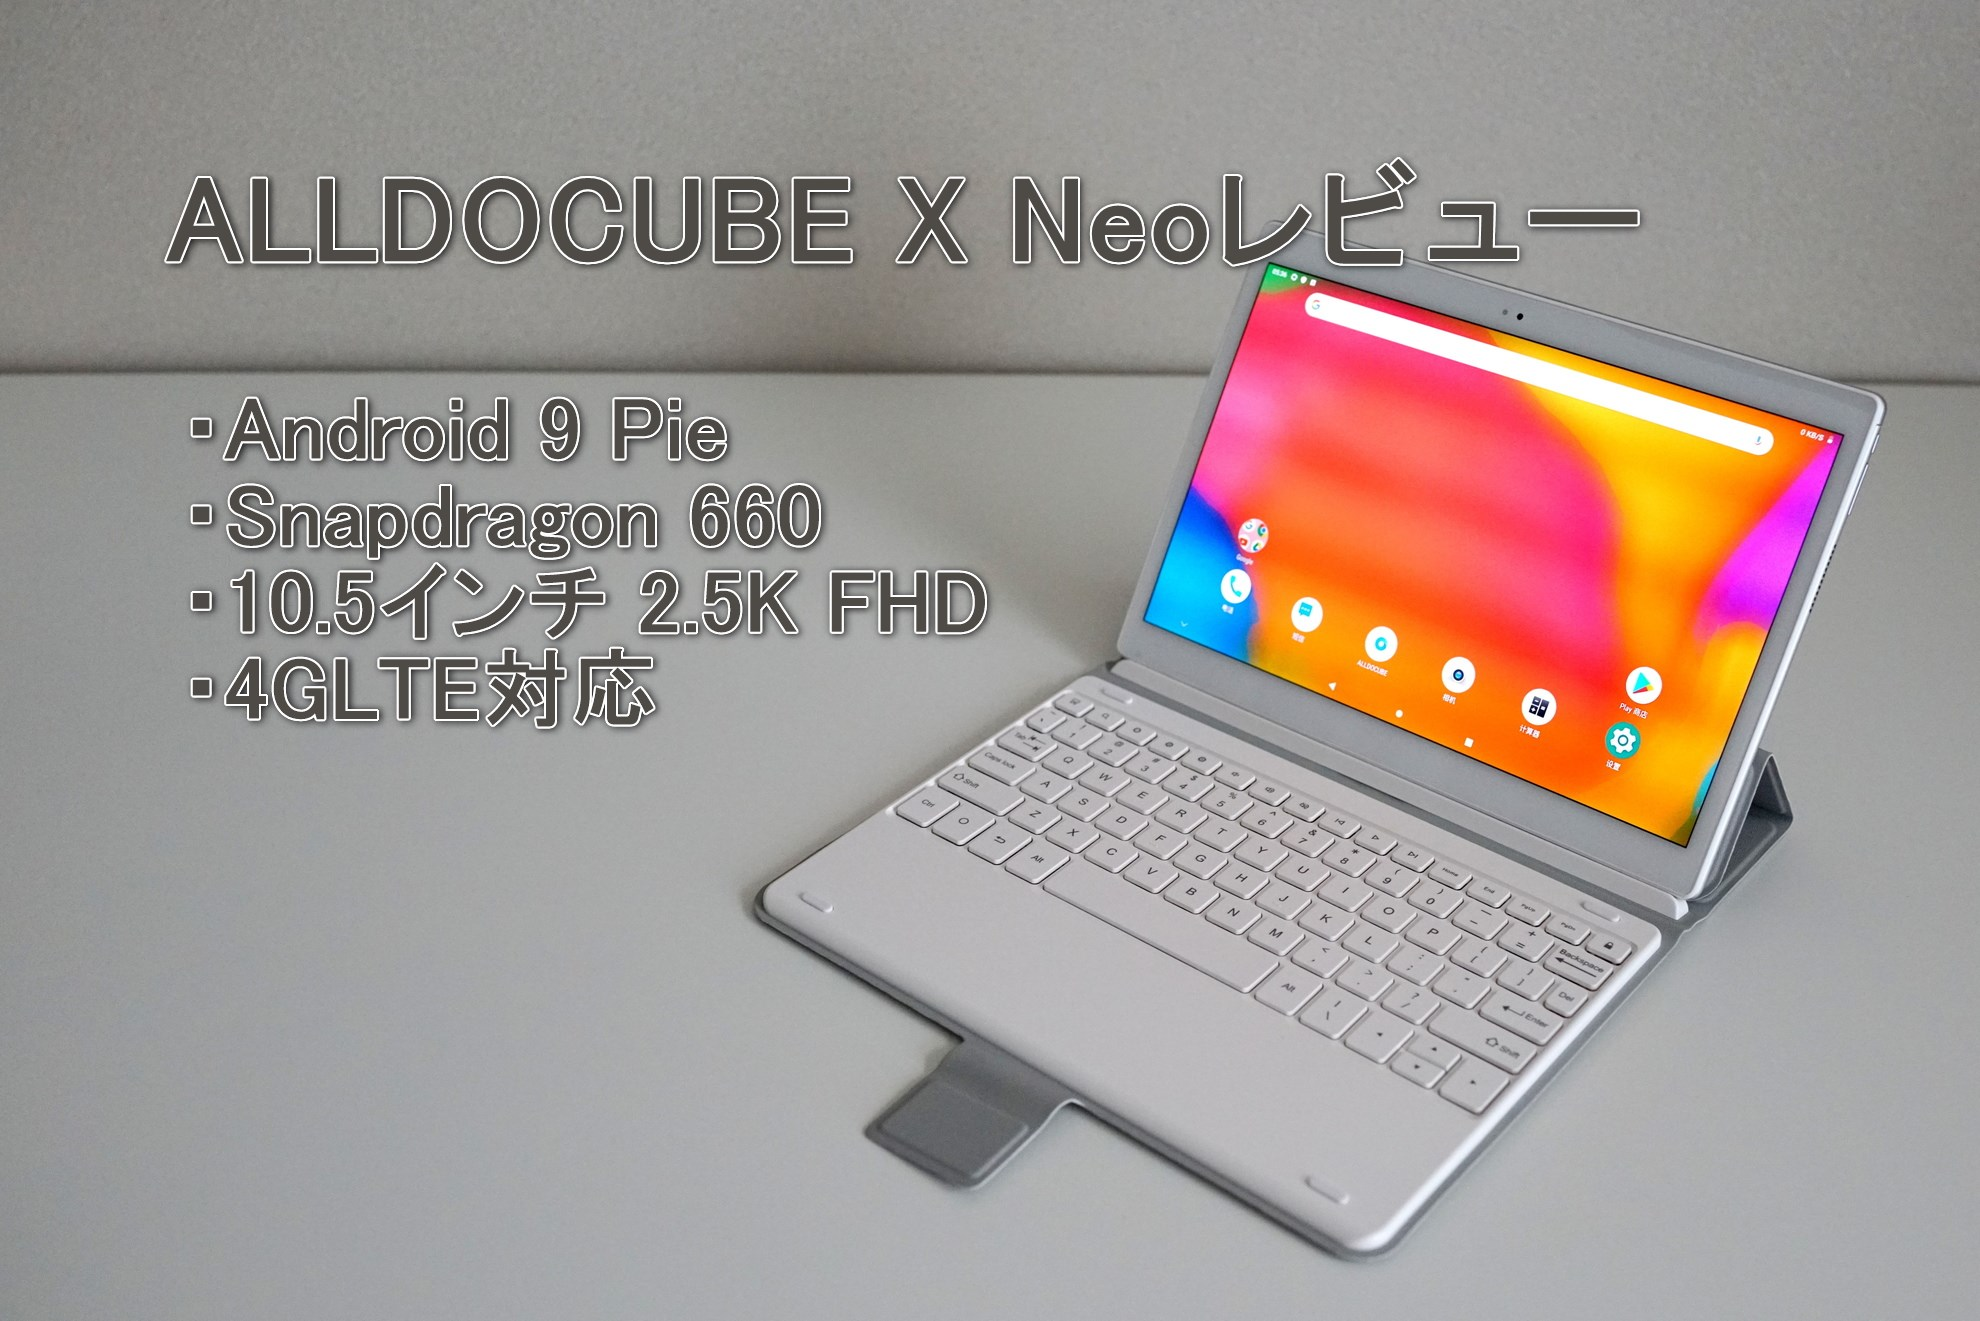 ALLDOCUBE X Neo レビュー